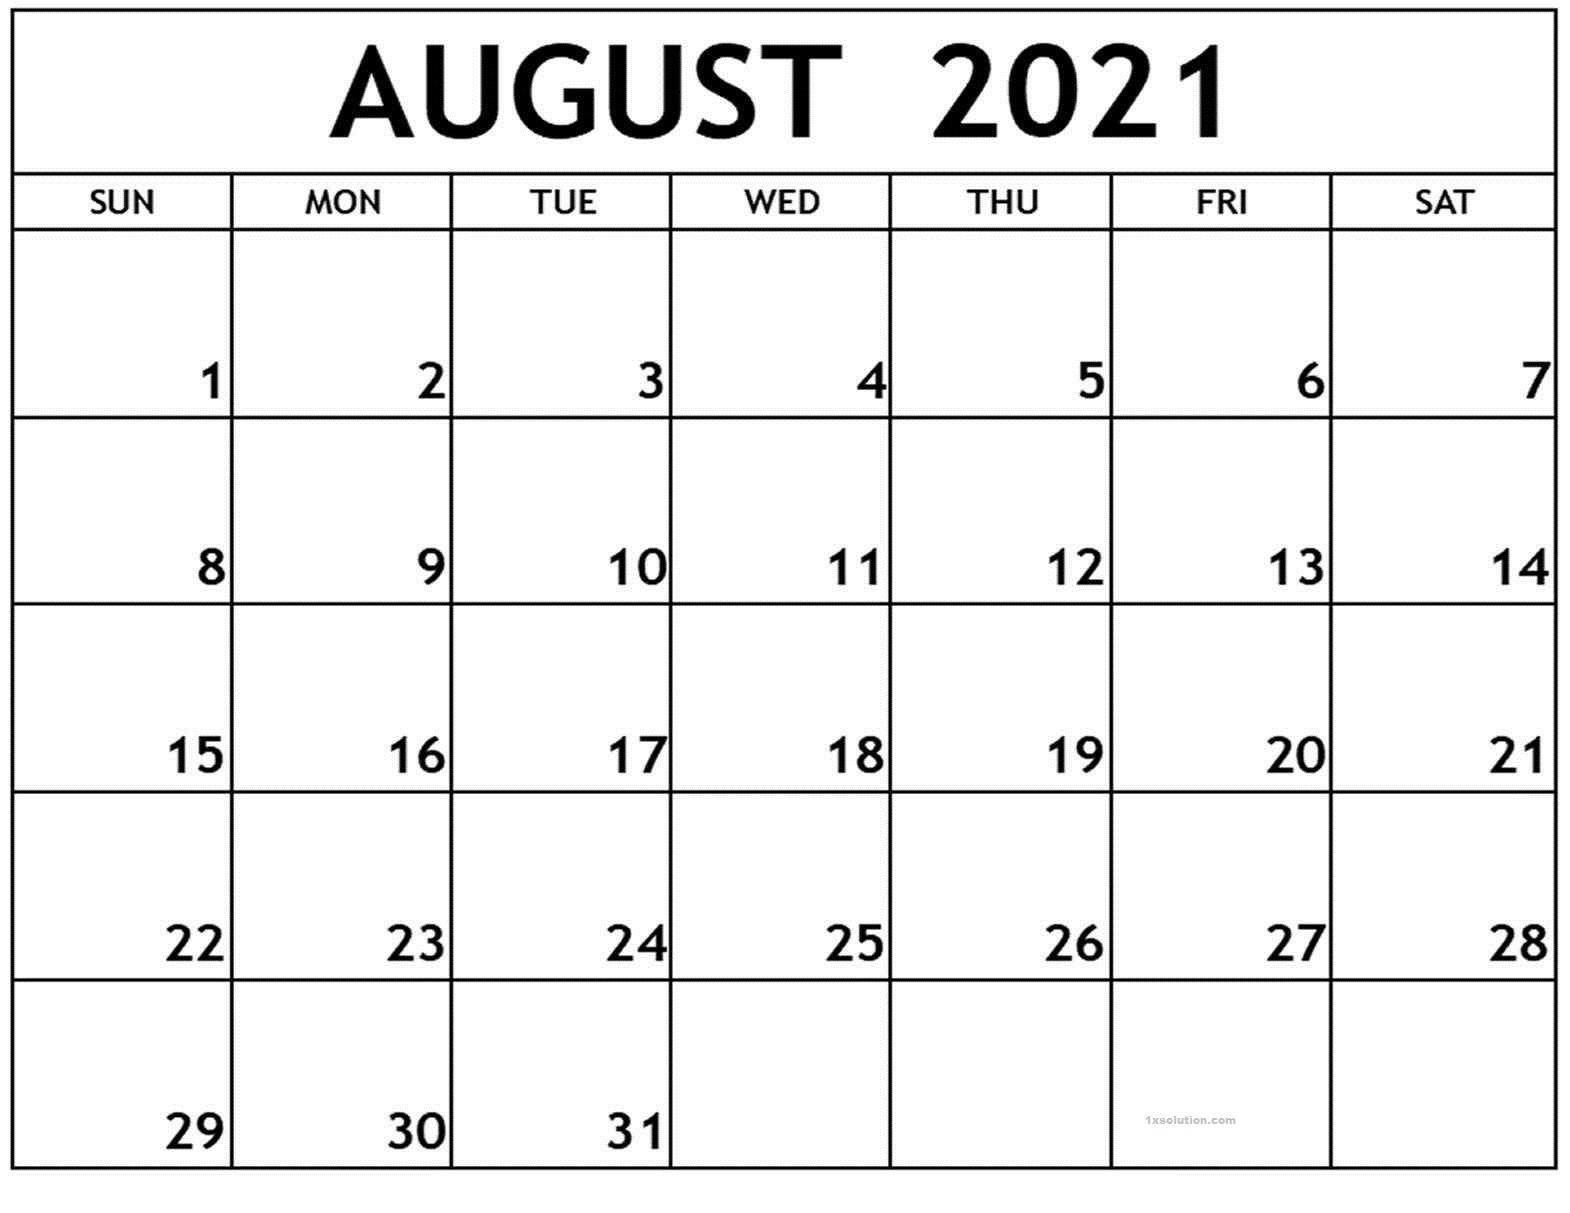 August 2021 Calendar Printable Schedule Excelsheet   Calendar throughout Google Printable Monthly Calendar 2021